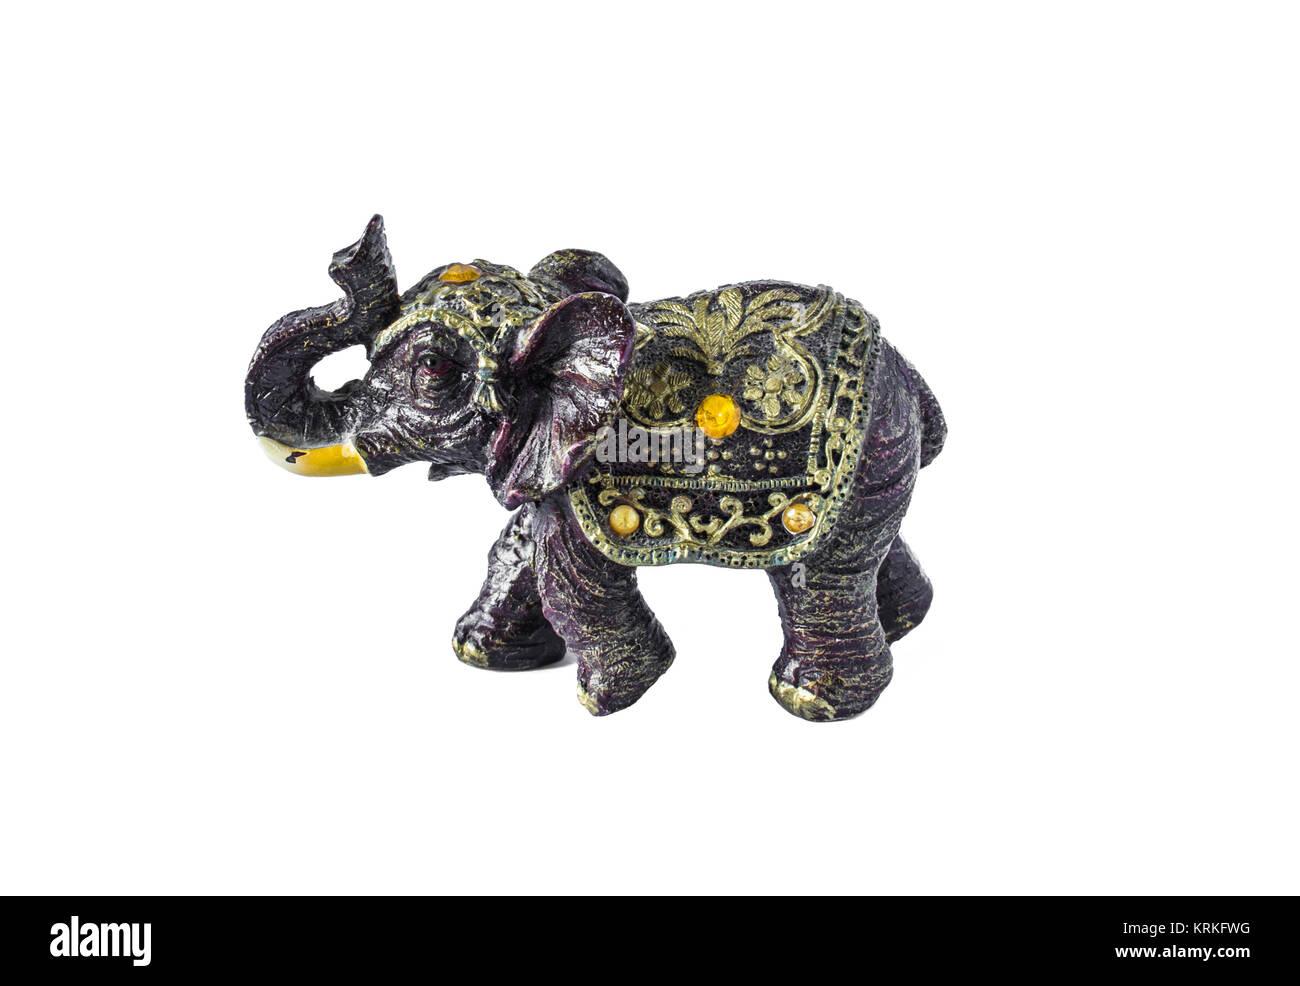 Elephant a symbol of good luck feng shui elephant isolated on elephant a symbol of good luck feng shui elephant isolated on white background biocorpaavc